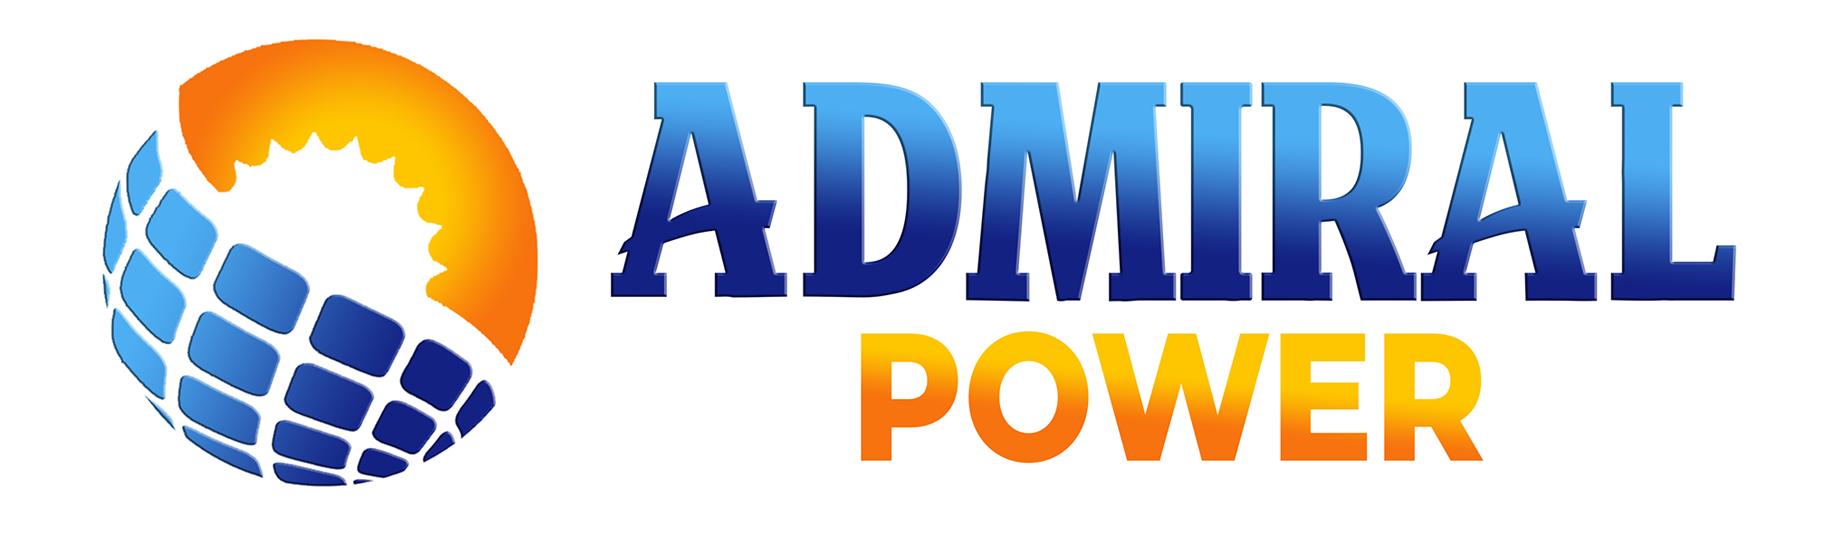 Admiral Power